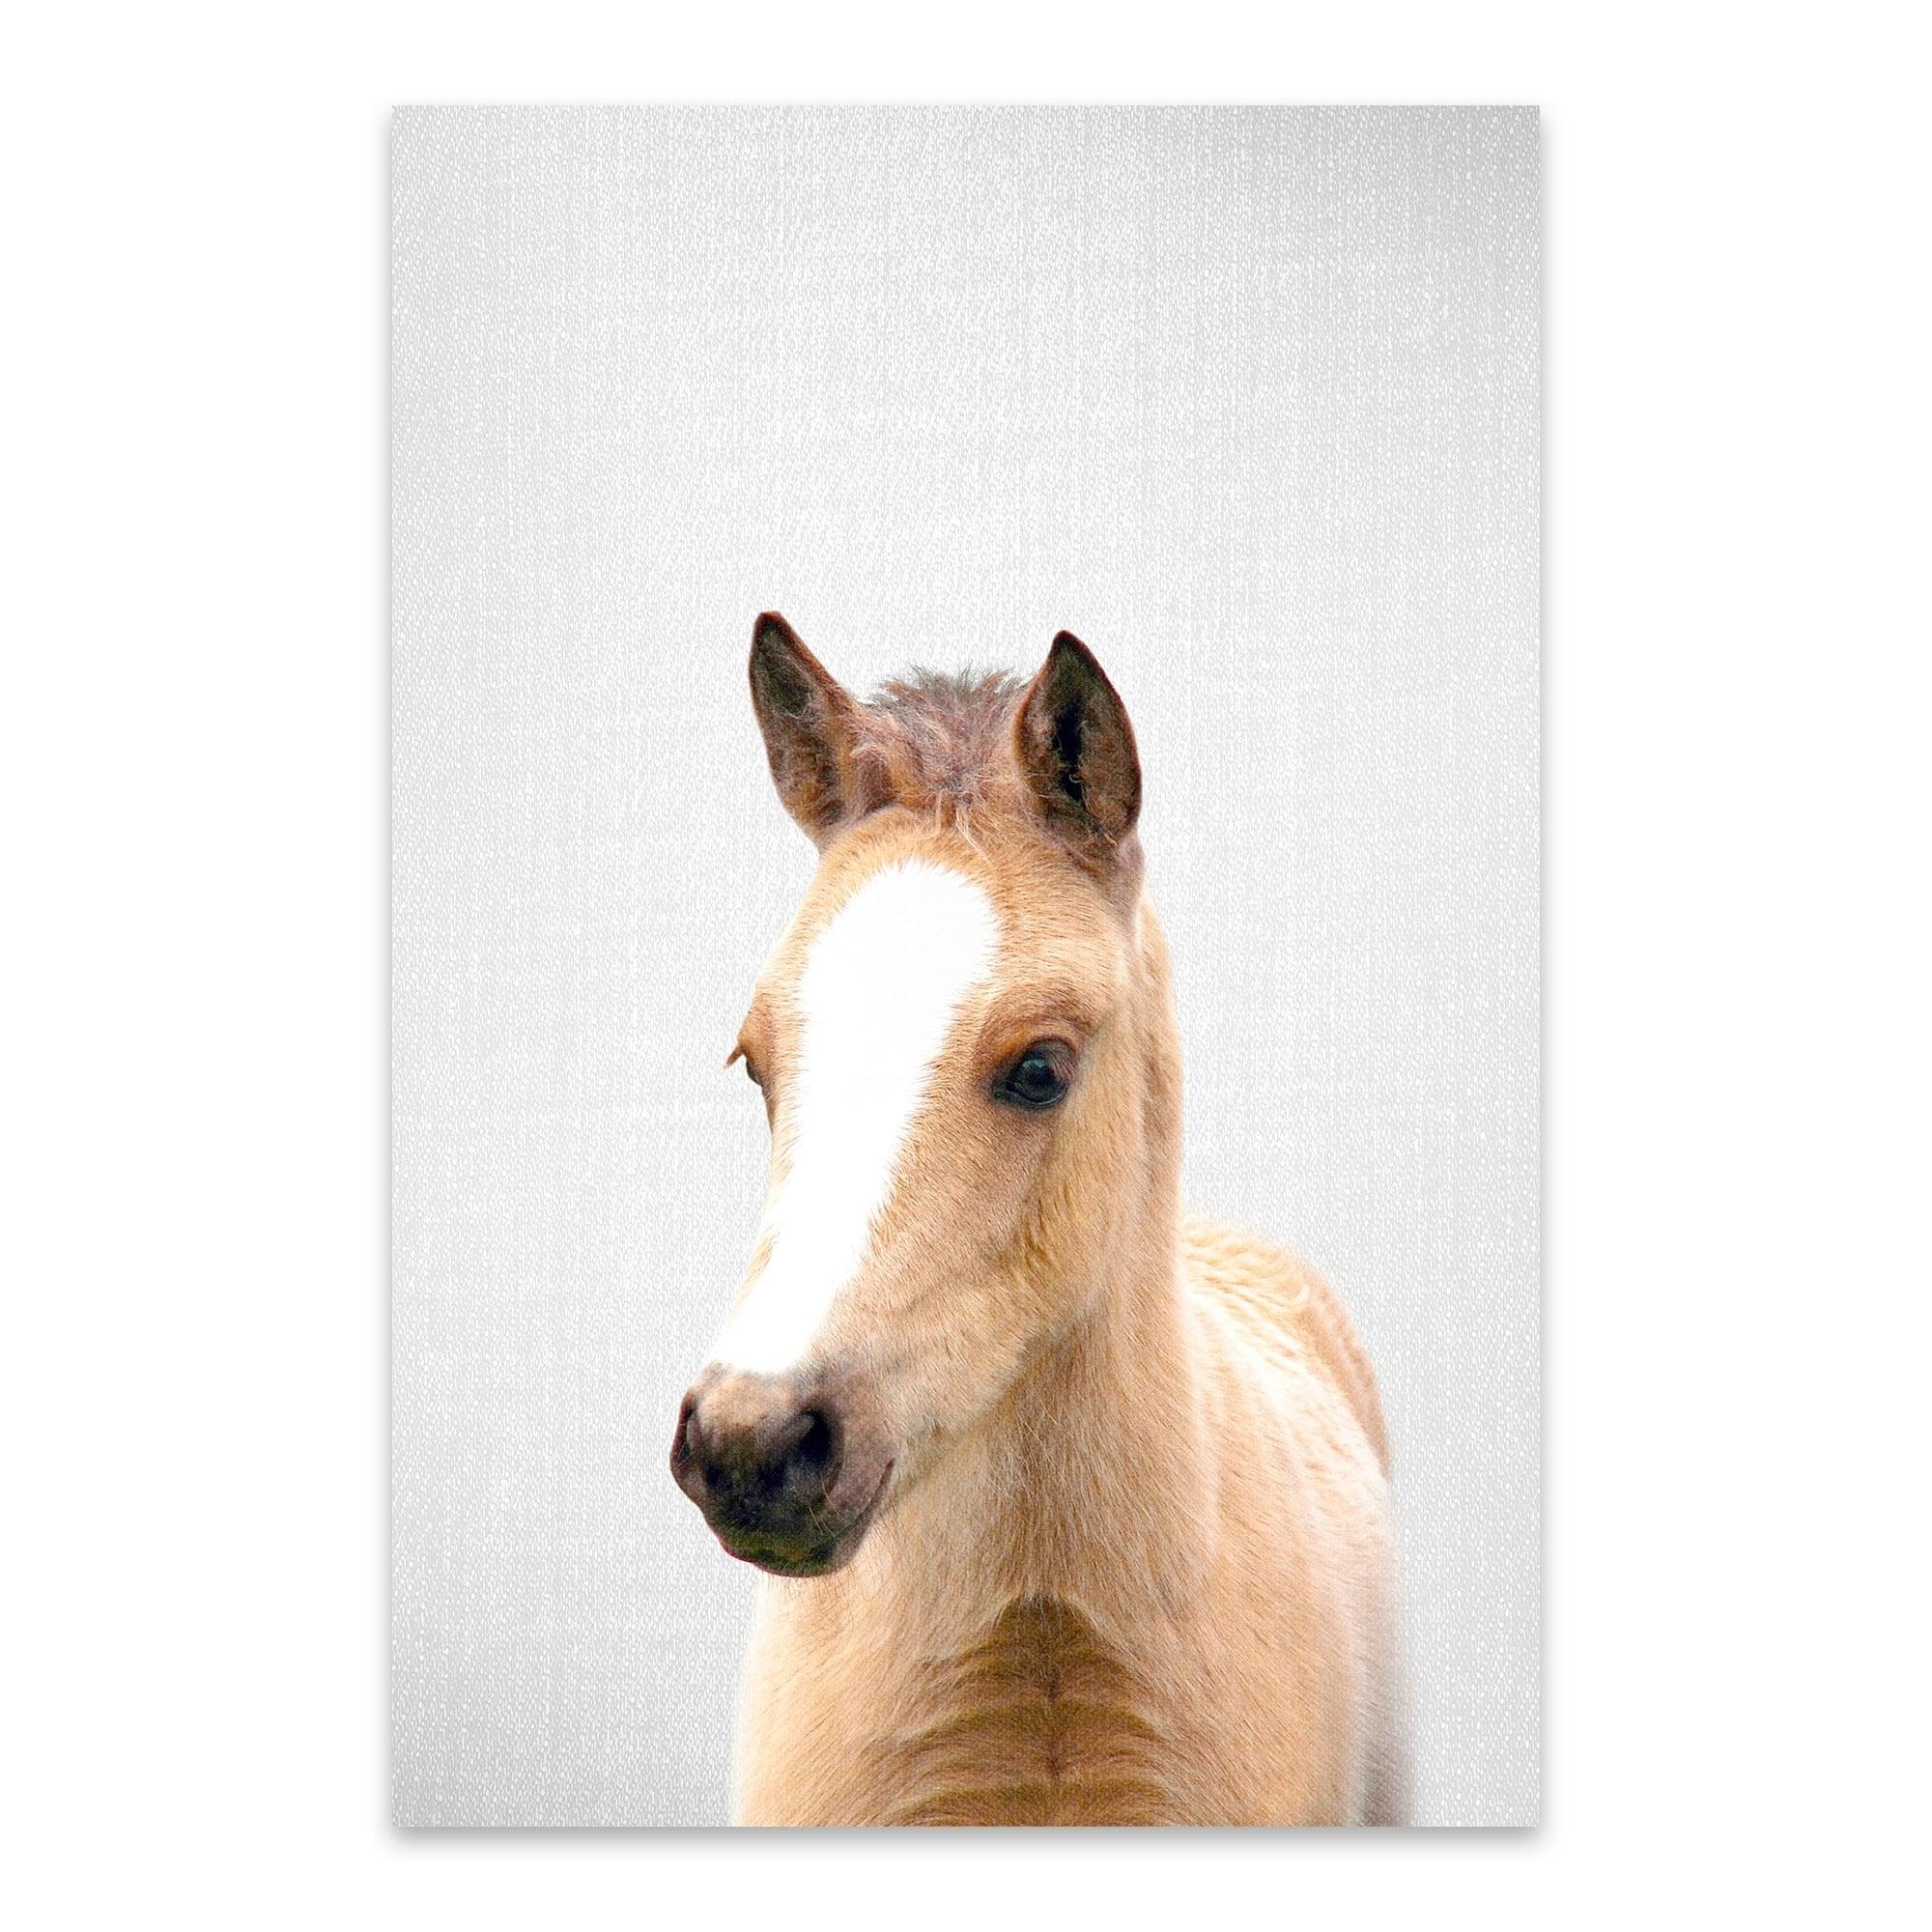 Shop Gal Design Baby Horse Noir Gallery Cute Peekaboo Animal Metal Wall Art Print Overstock 27560299